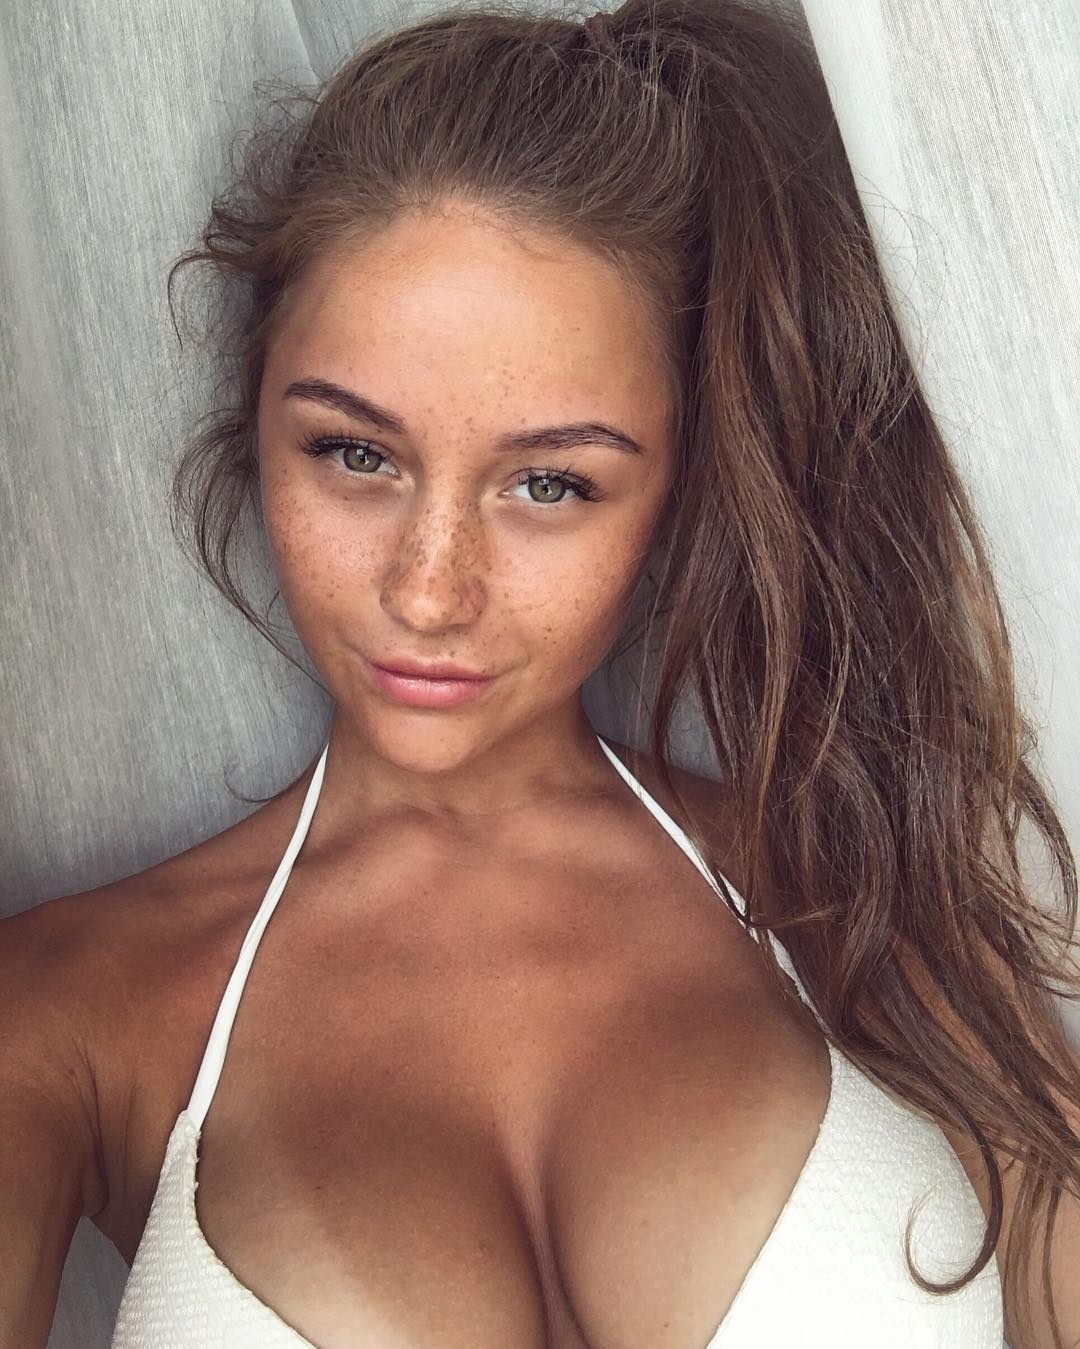 Katysheva naked olga Olga Katysheva